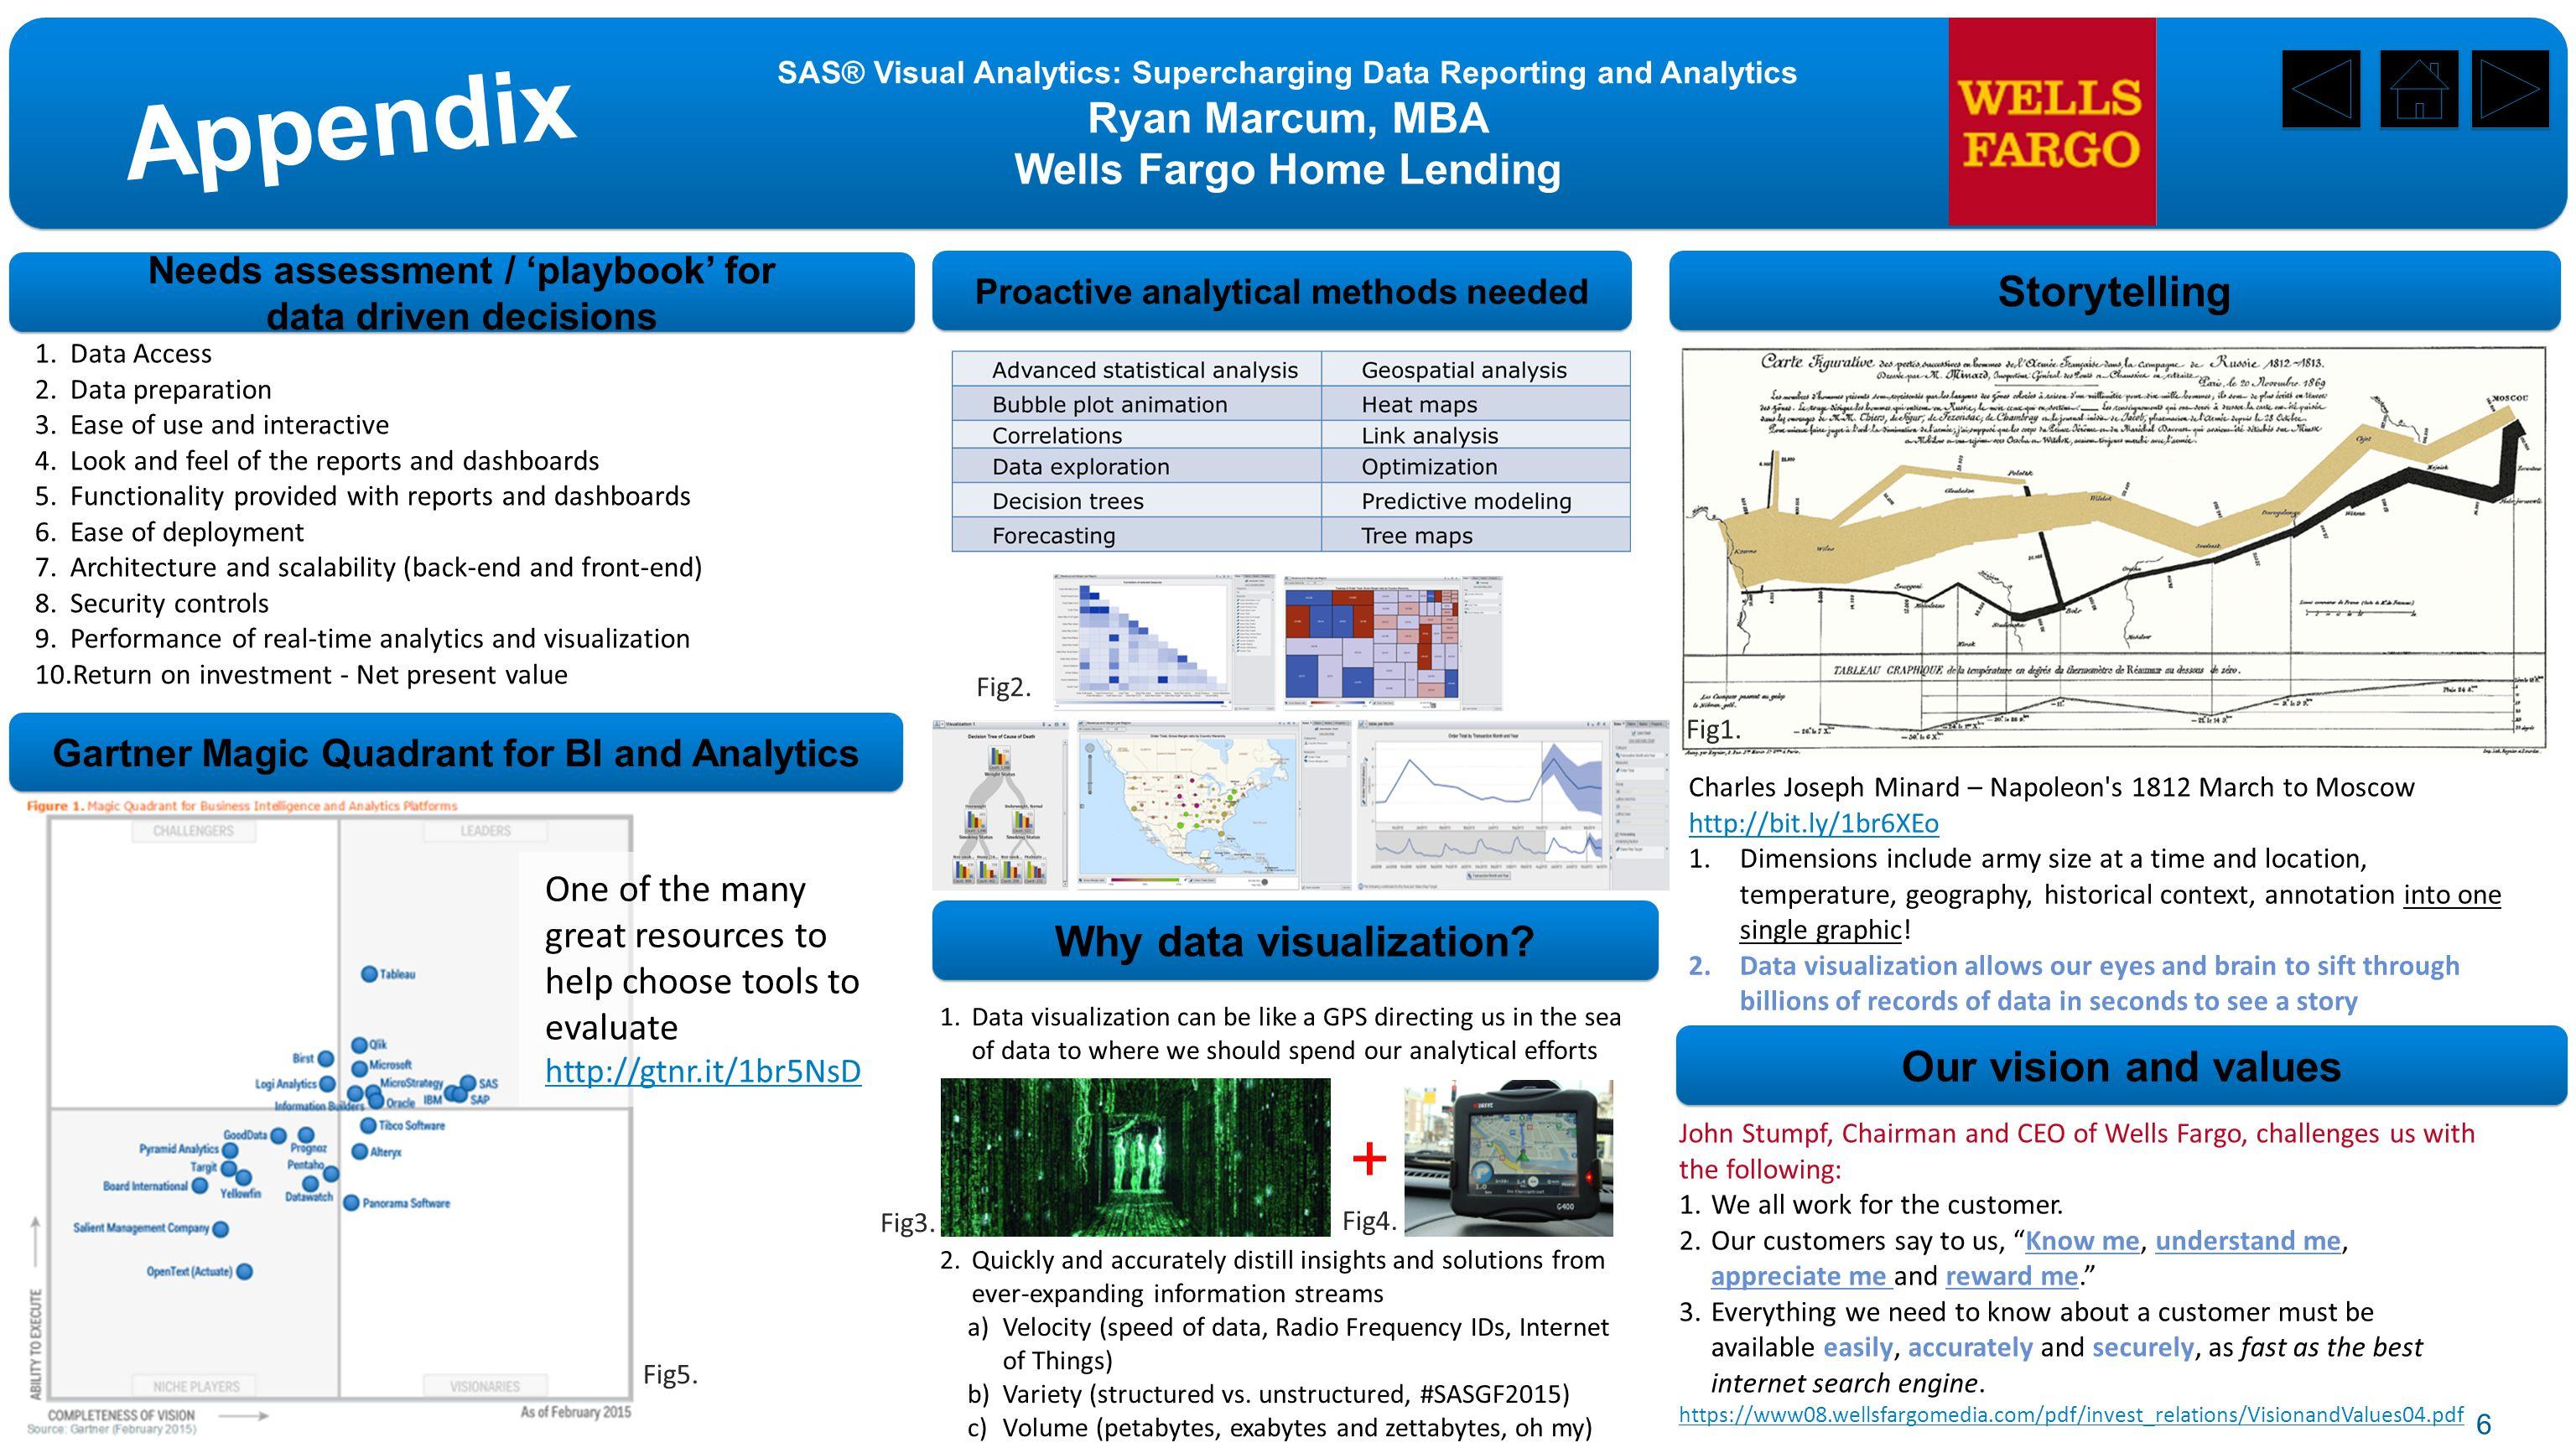 SAS® Visual Analytics: Supercharging Data Reporting and